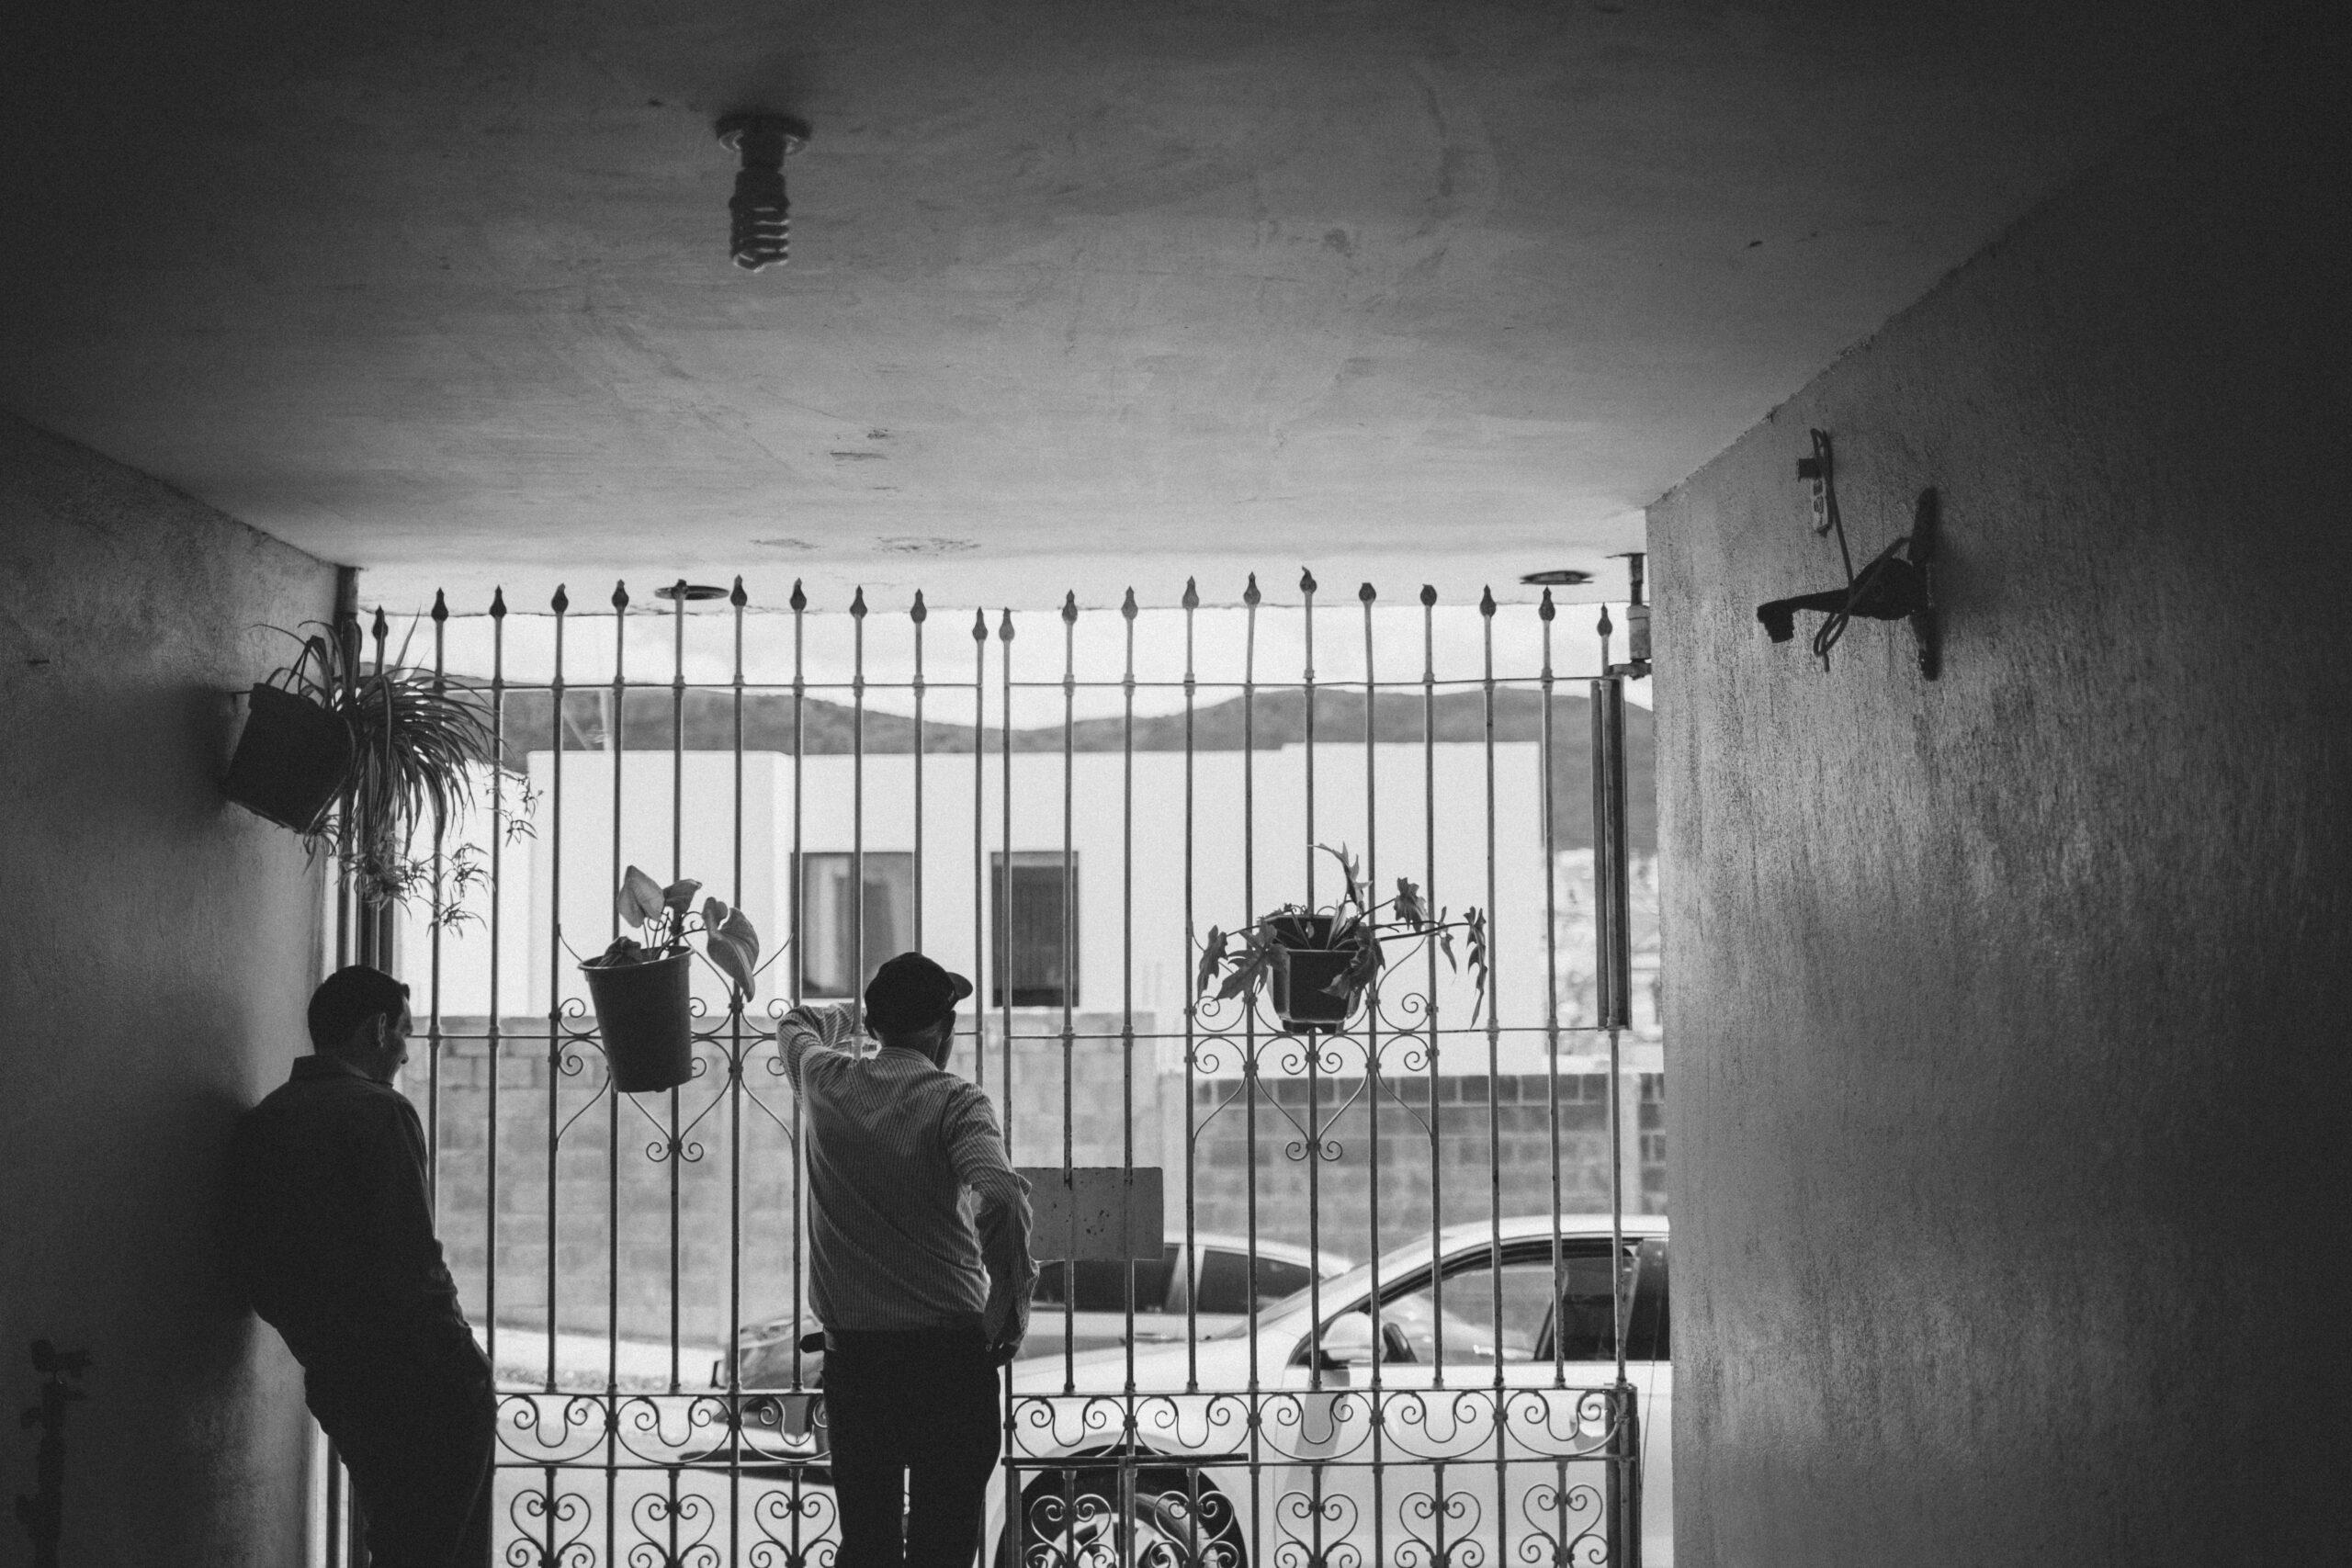 javier_noriega_fotografo_profesional_zacatecas_mexico_chihuahua_photographer5